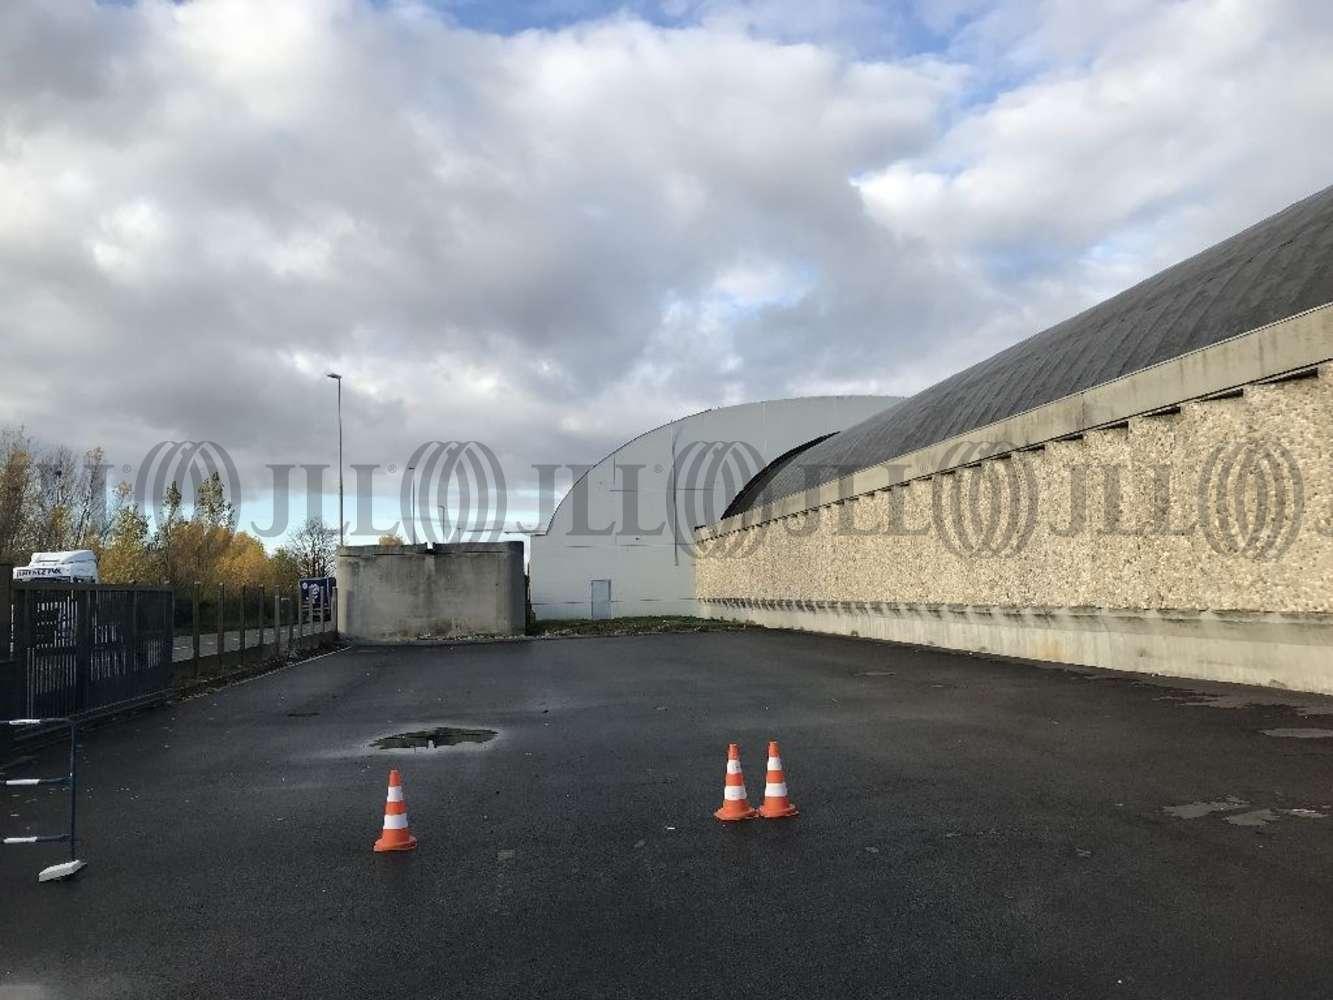 Activités/entrepôt Genay, 69730 - Entrepot à vendre Lyon Nord - Genay - 10312224